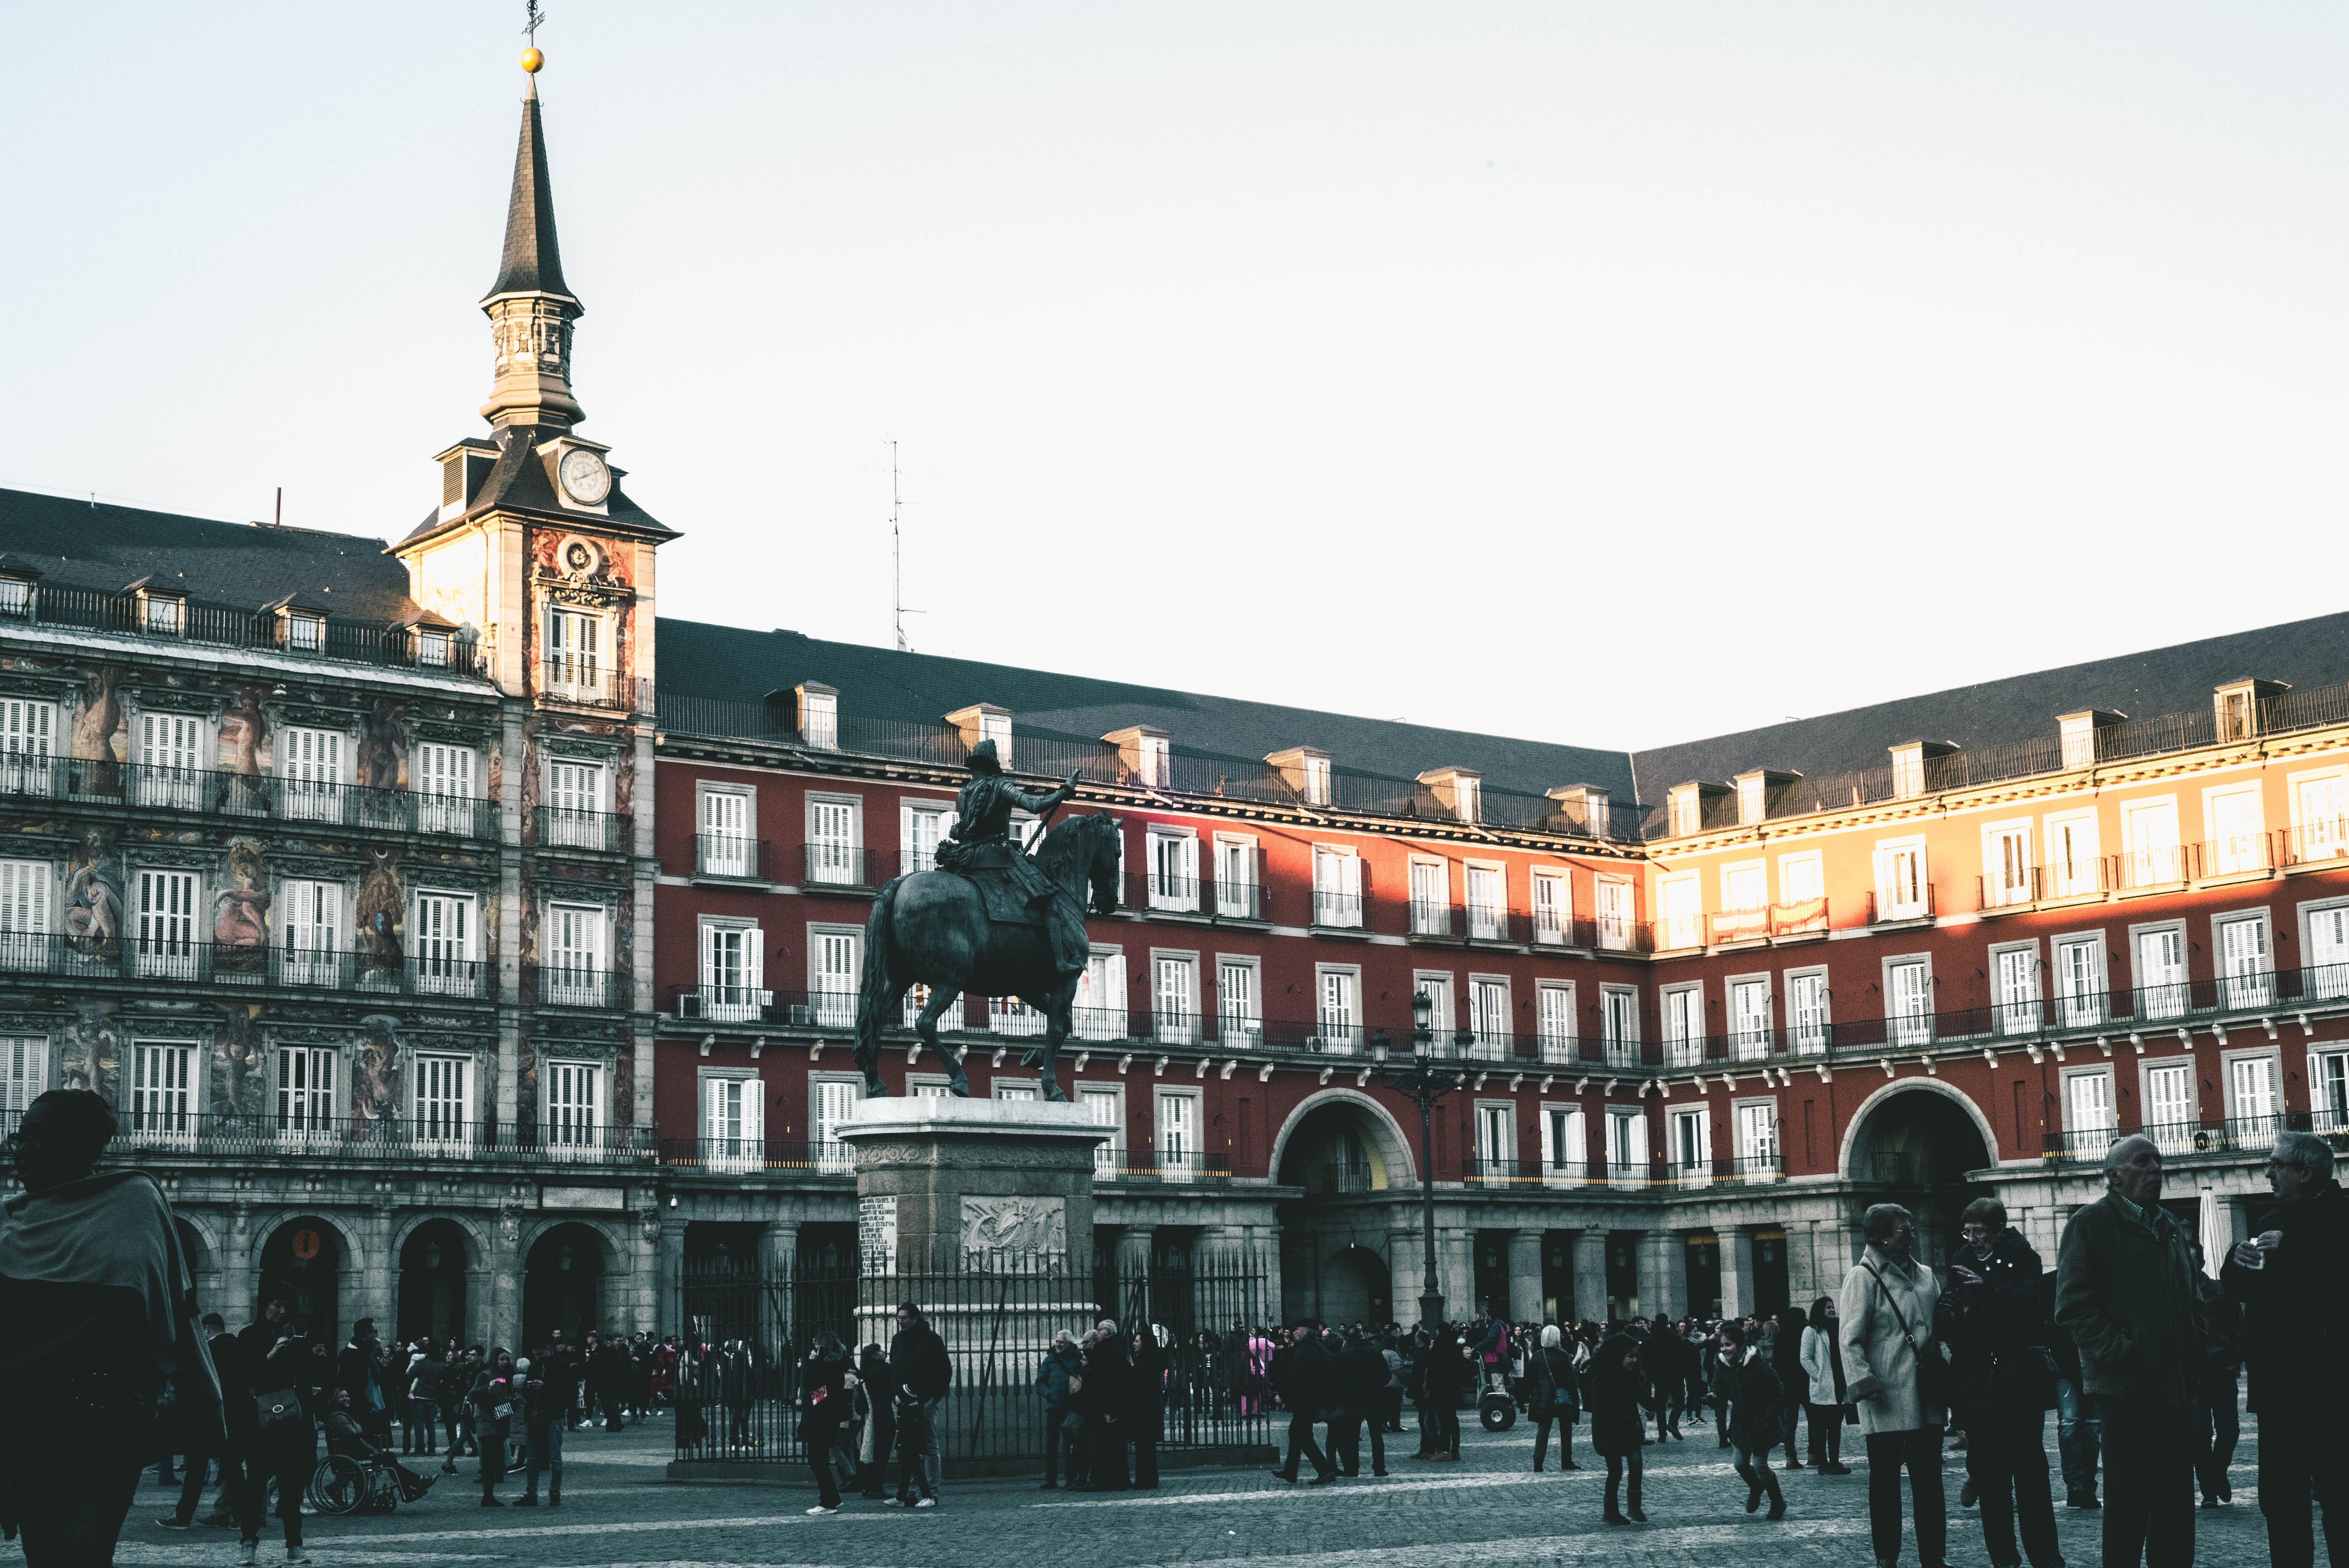 Day 2: Madrid